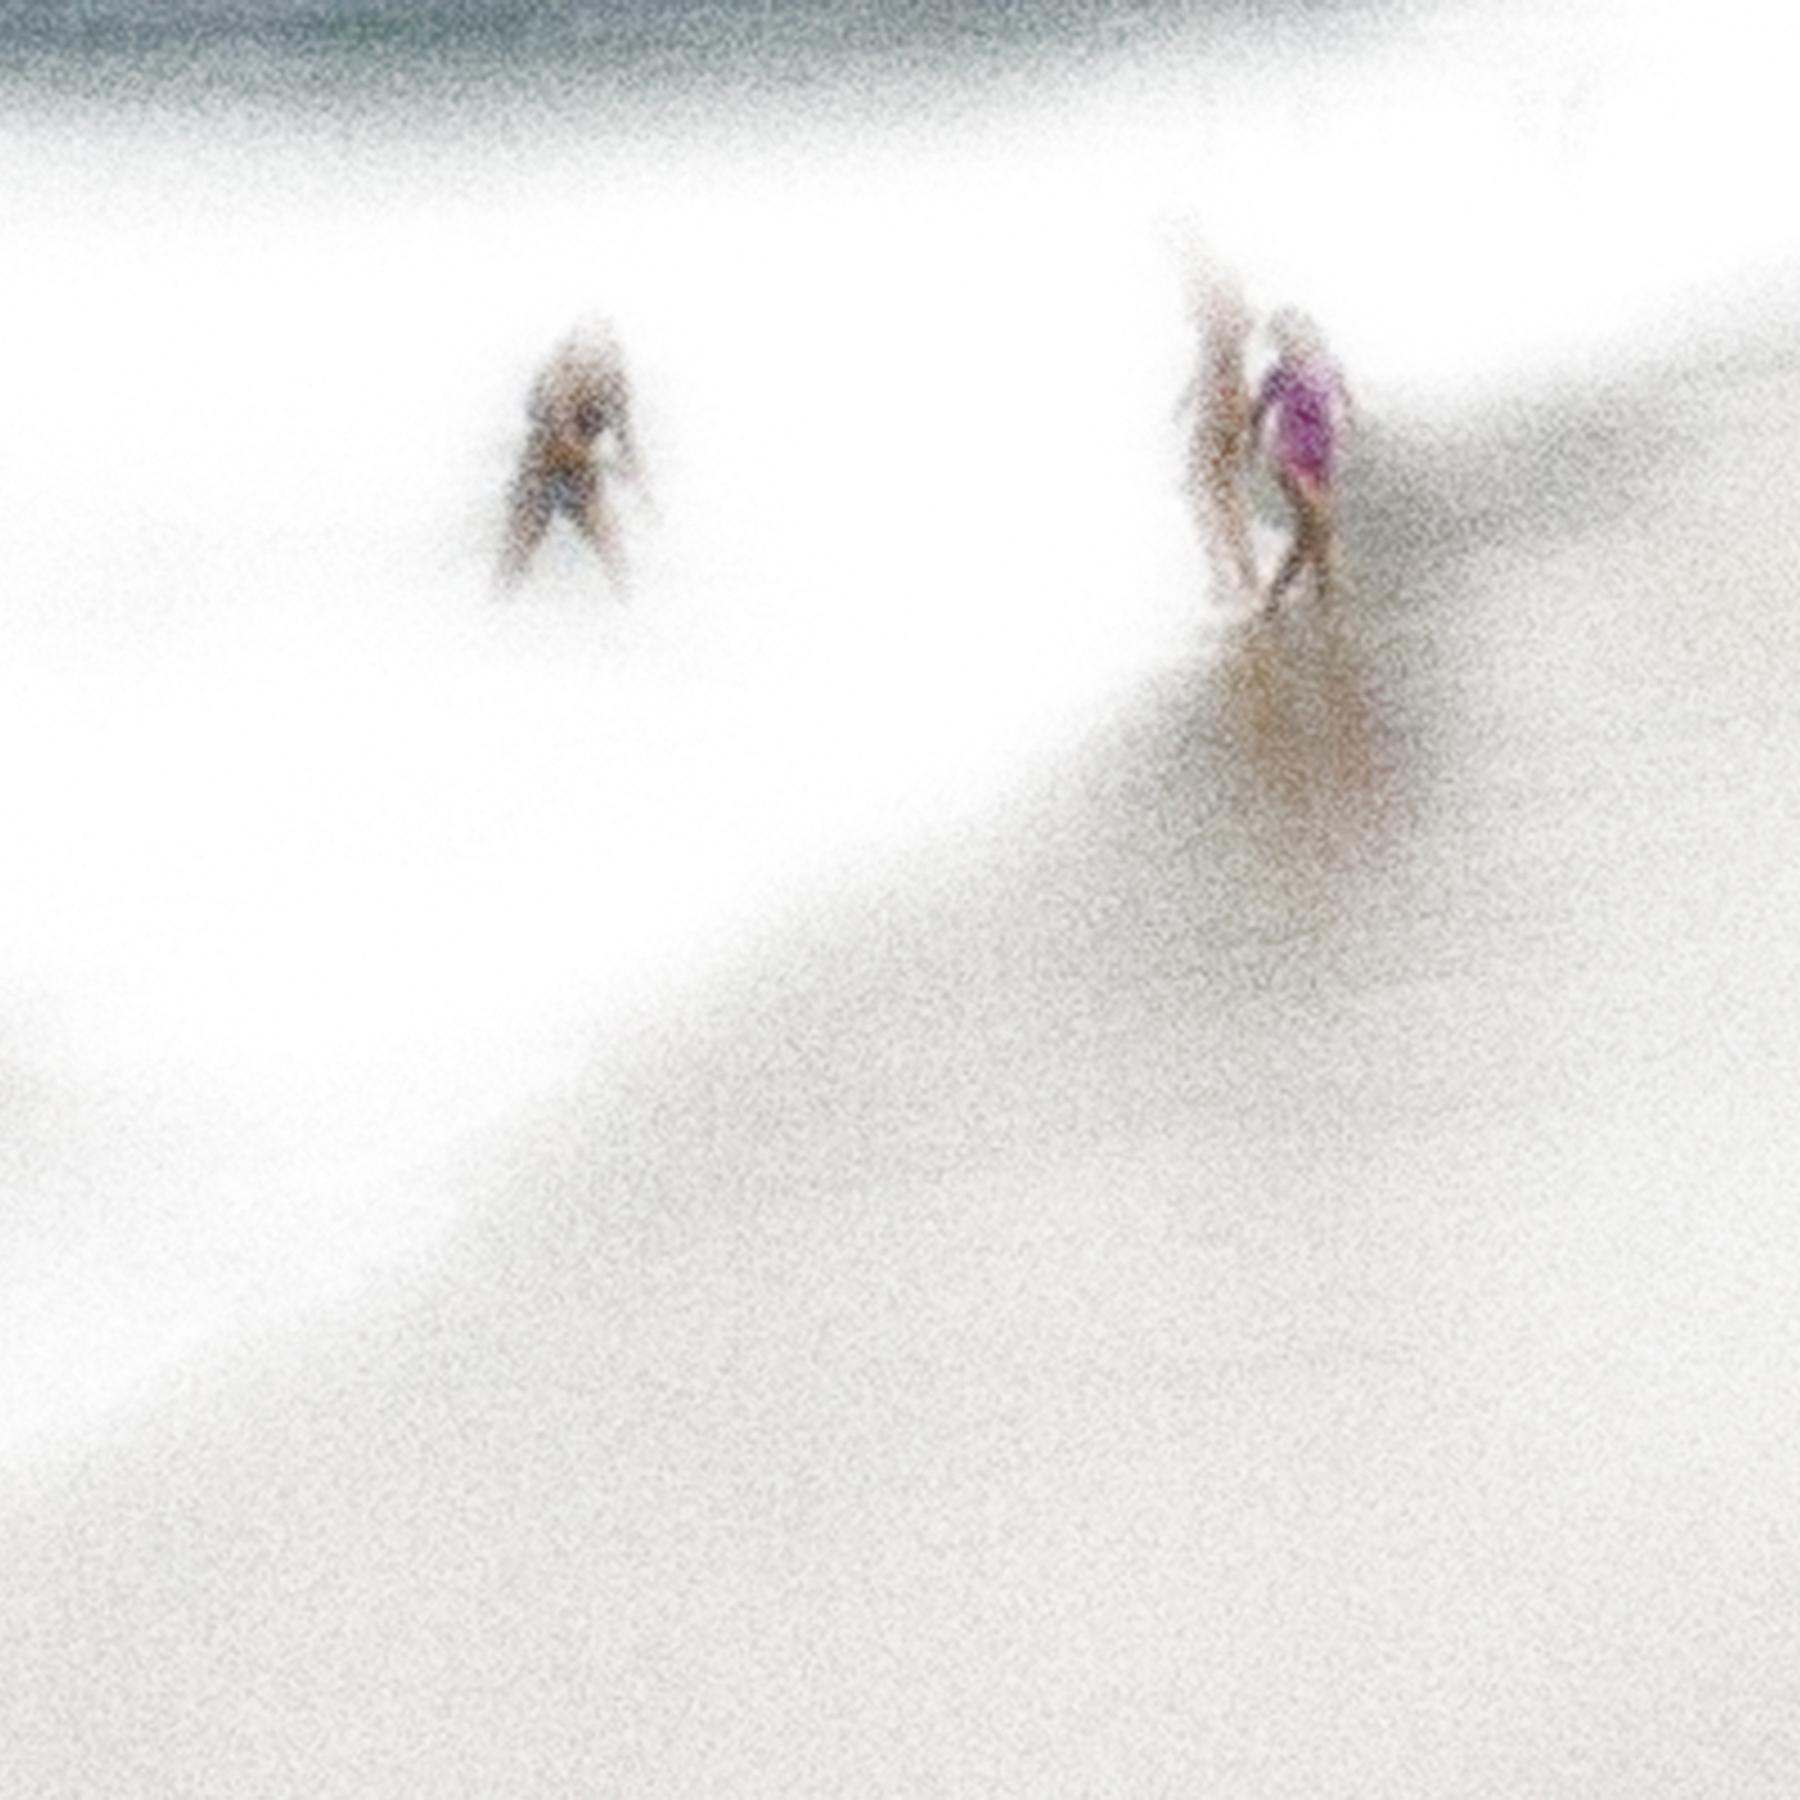 Dale_Johnson_Remembering Summer_Splashing_5.jpg